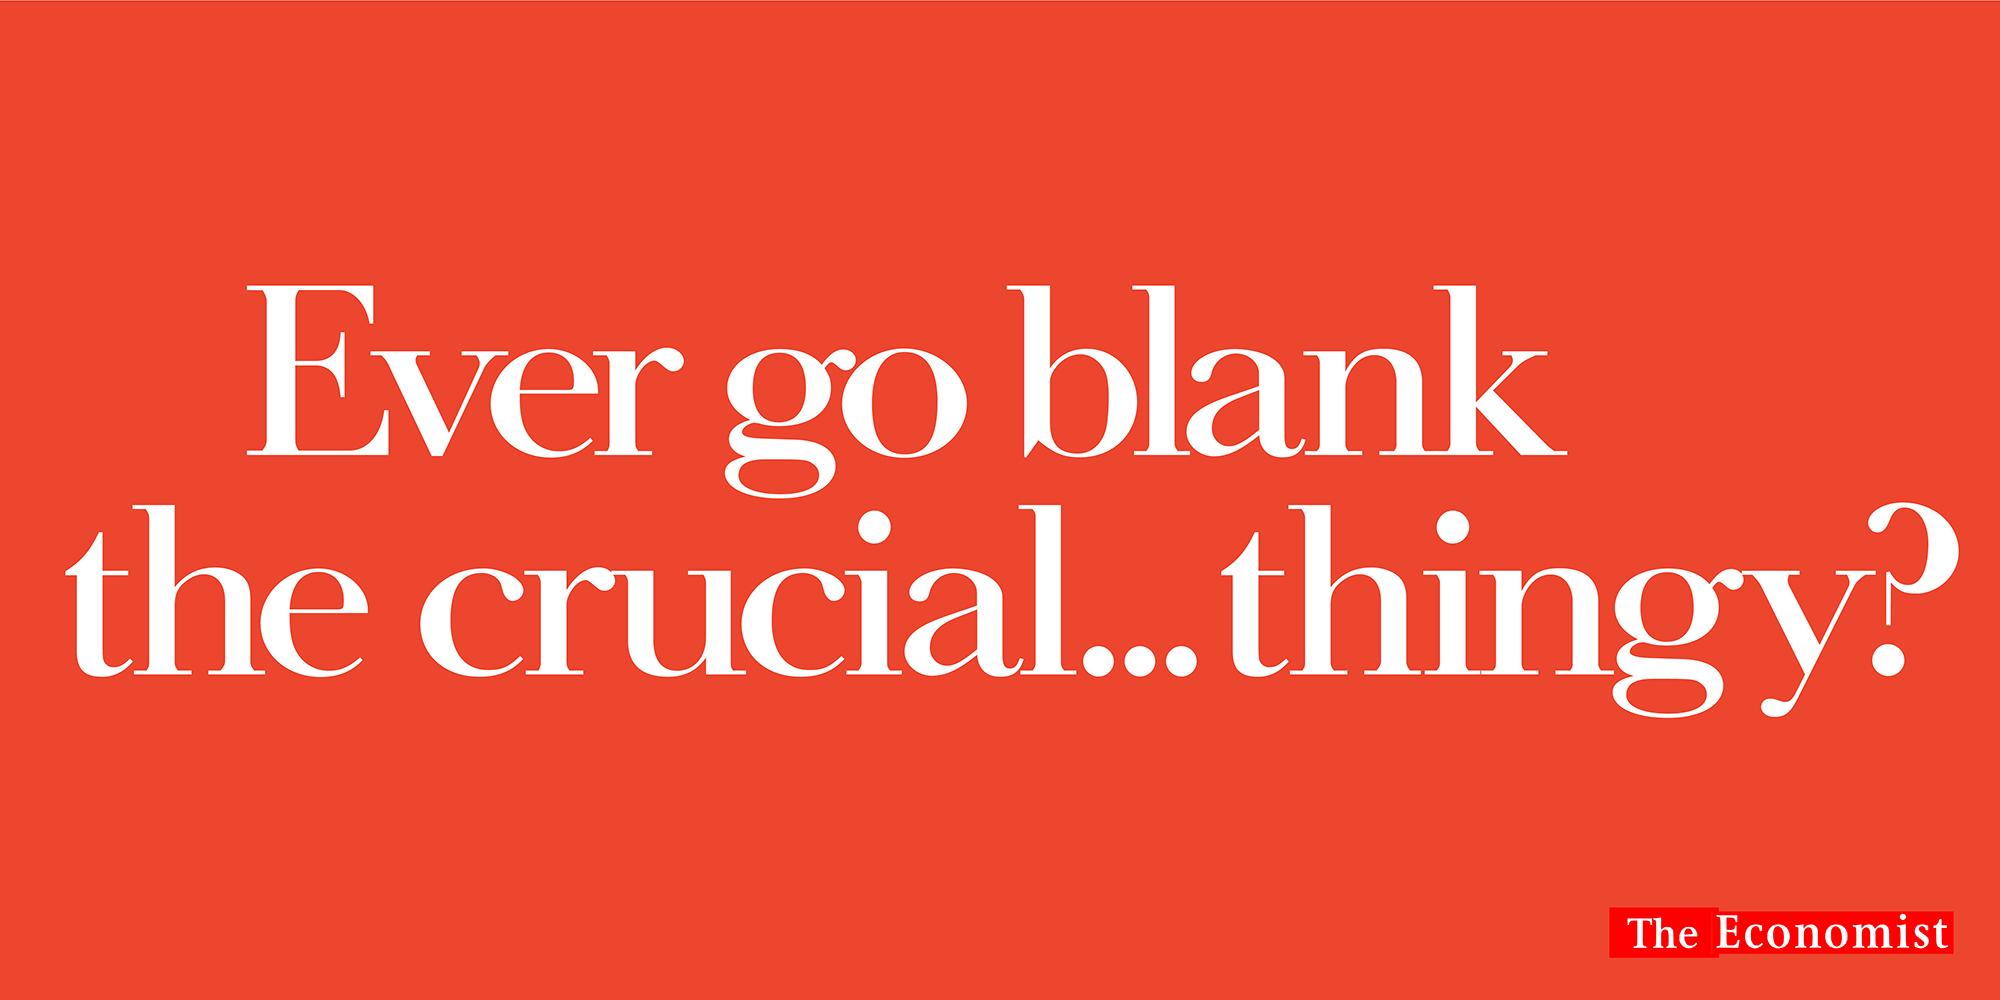 'Ever Go Blank' The Economist, Dave Dye, AMV_BBDO